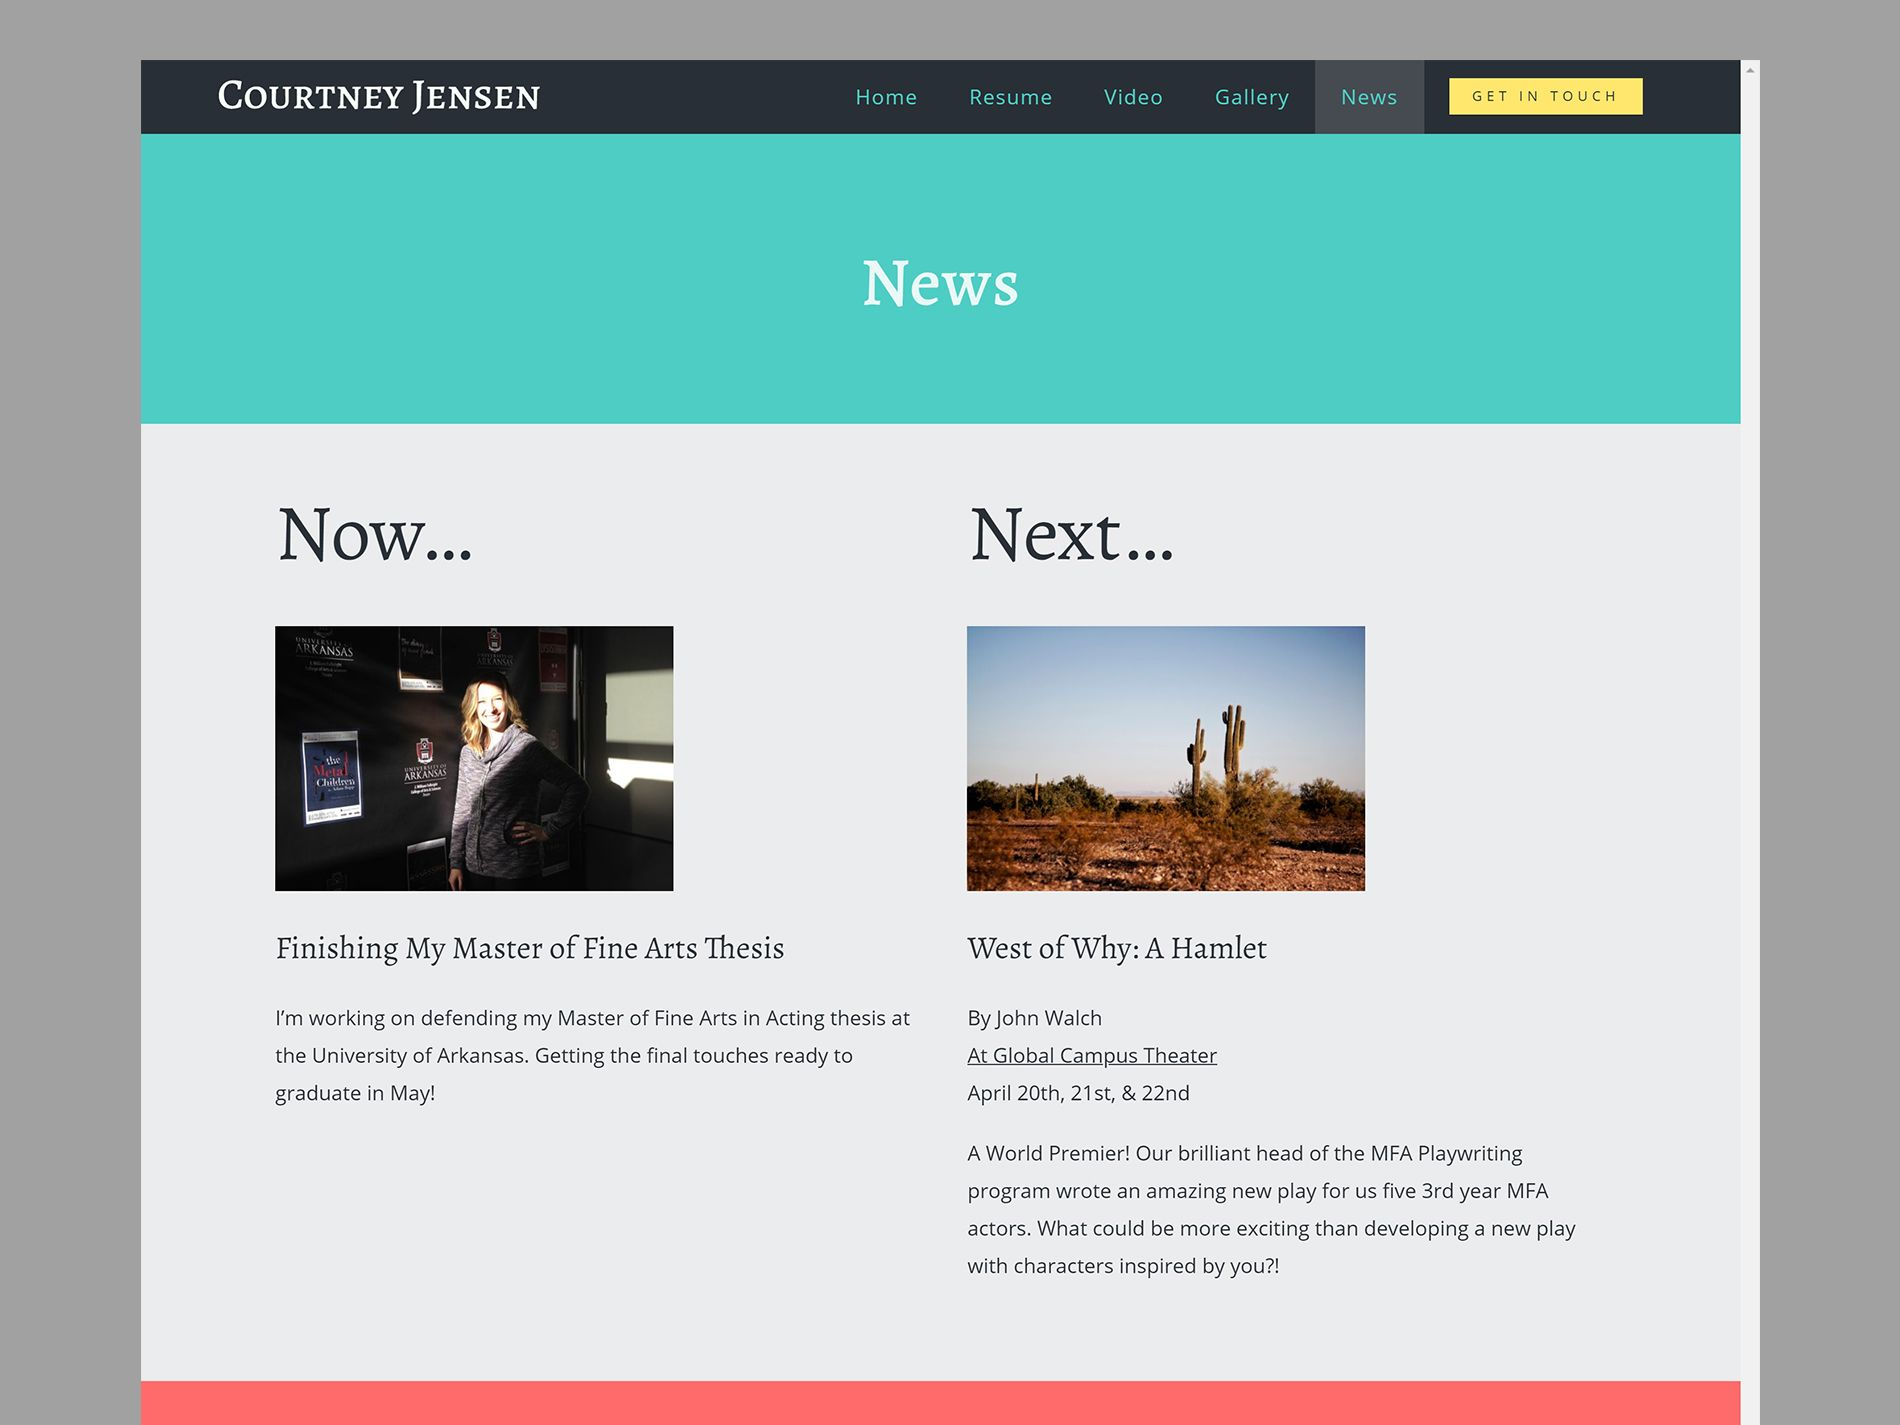 Courtney Jensen Website News